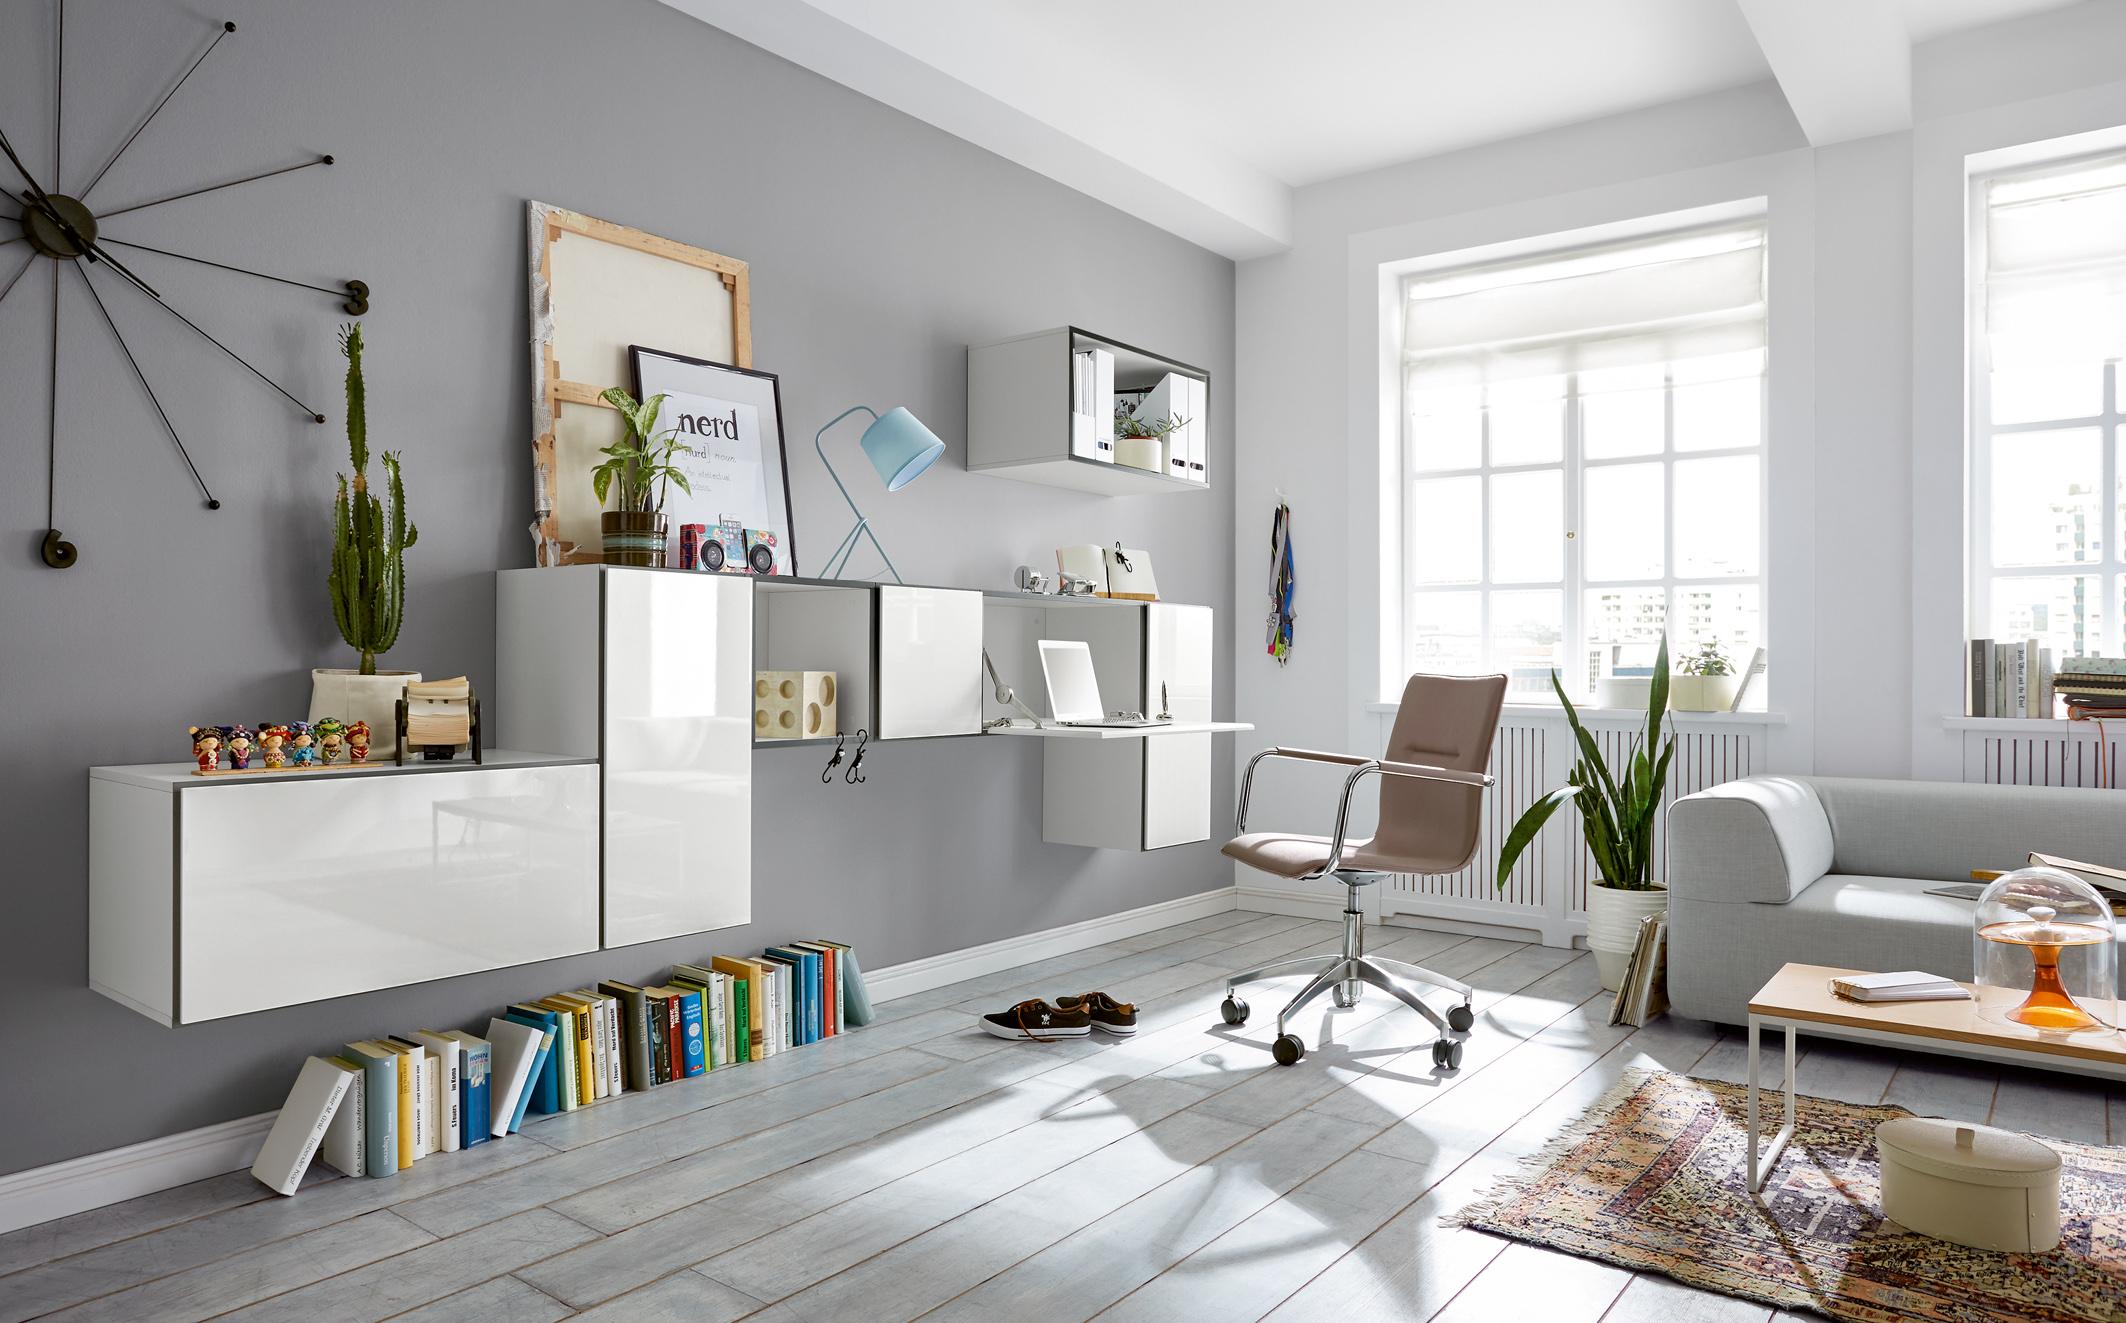 vdm 2017 pm huelsta2. Black Bedroom Furniture Sets. Home Design Ideas